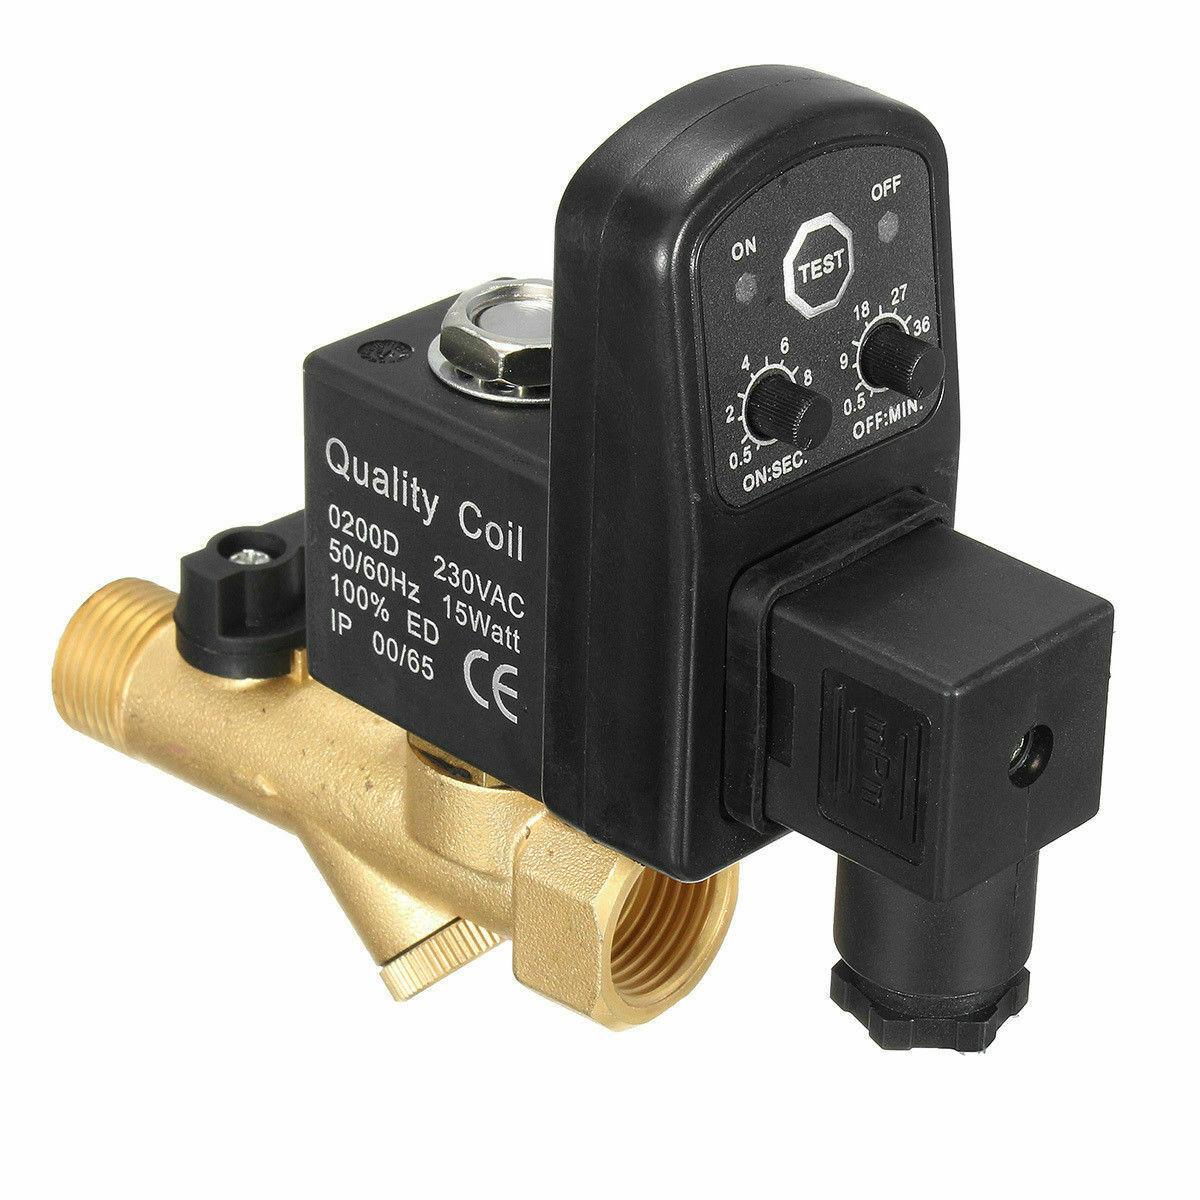 AutoDrain For Compressor 1/2BSP